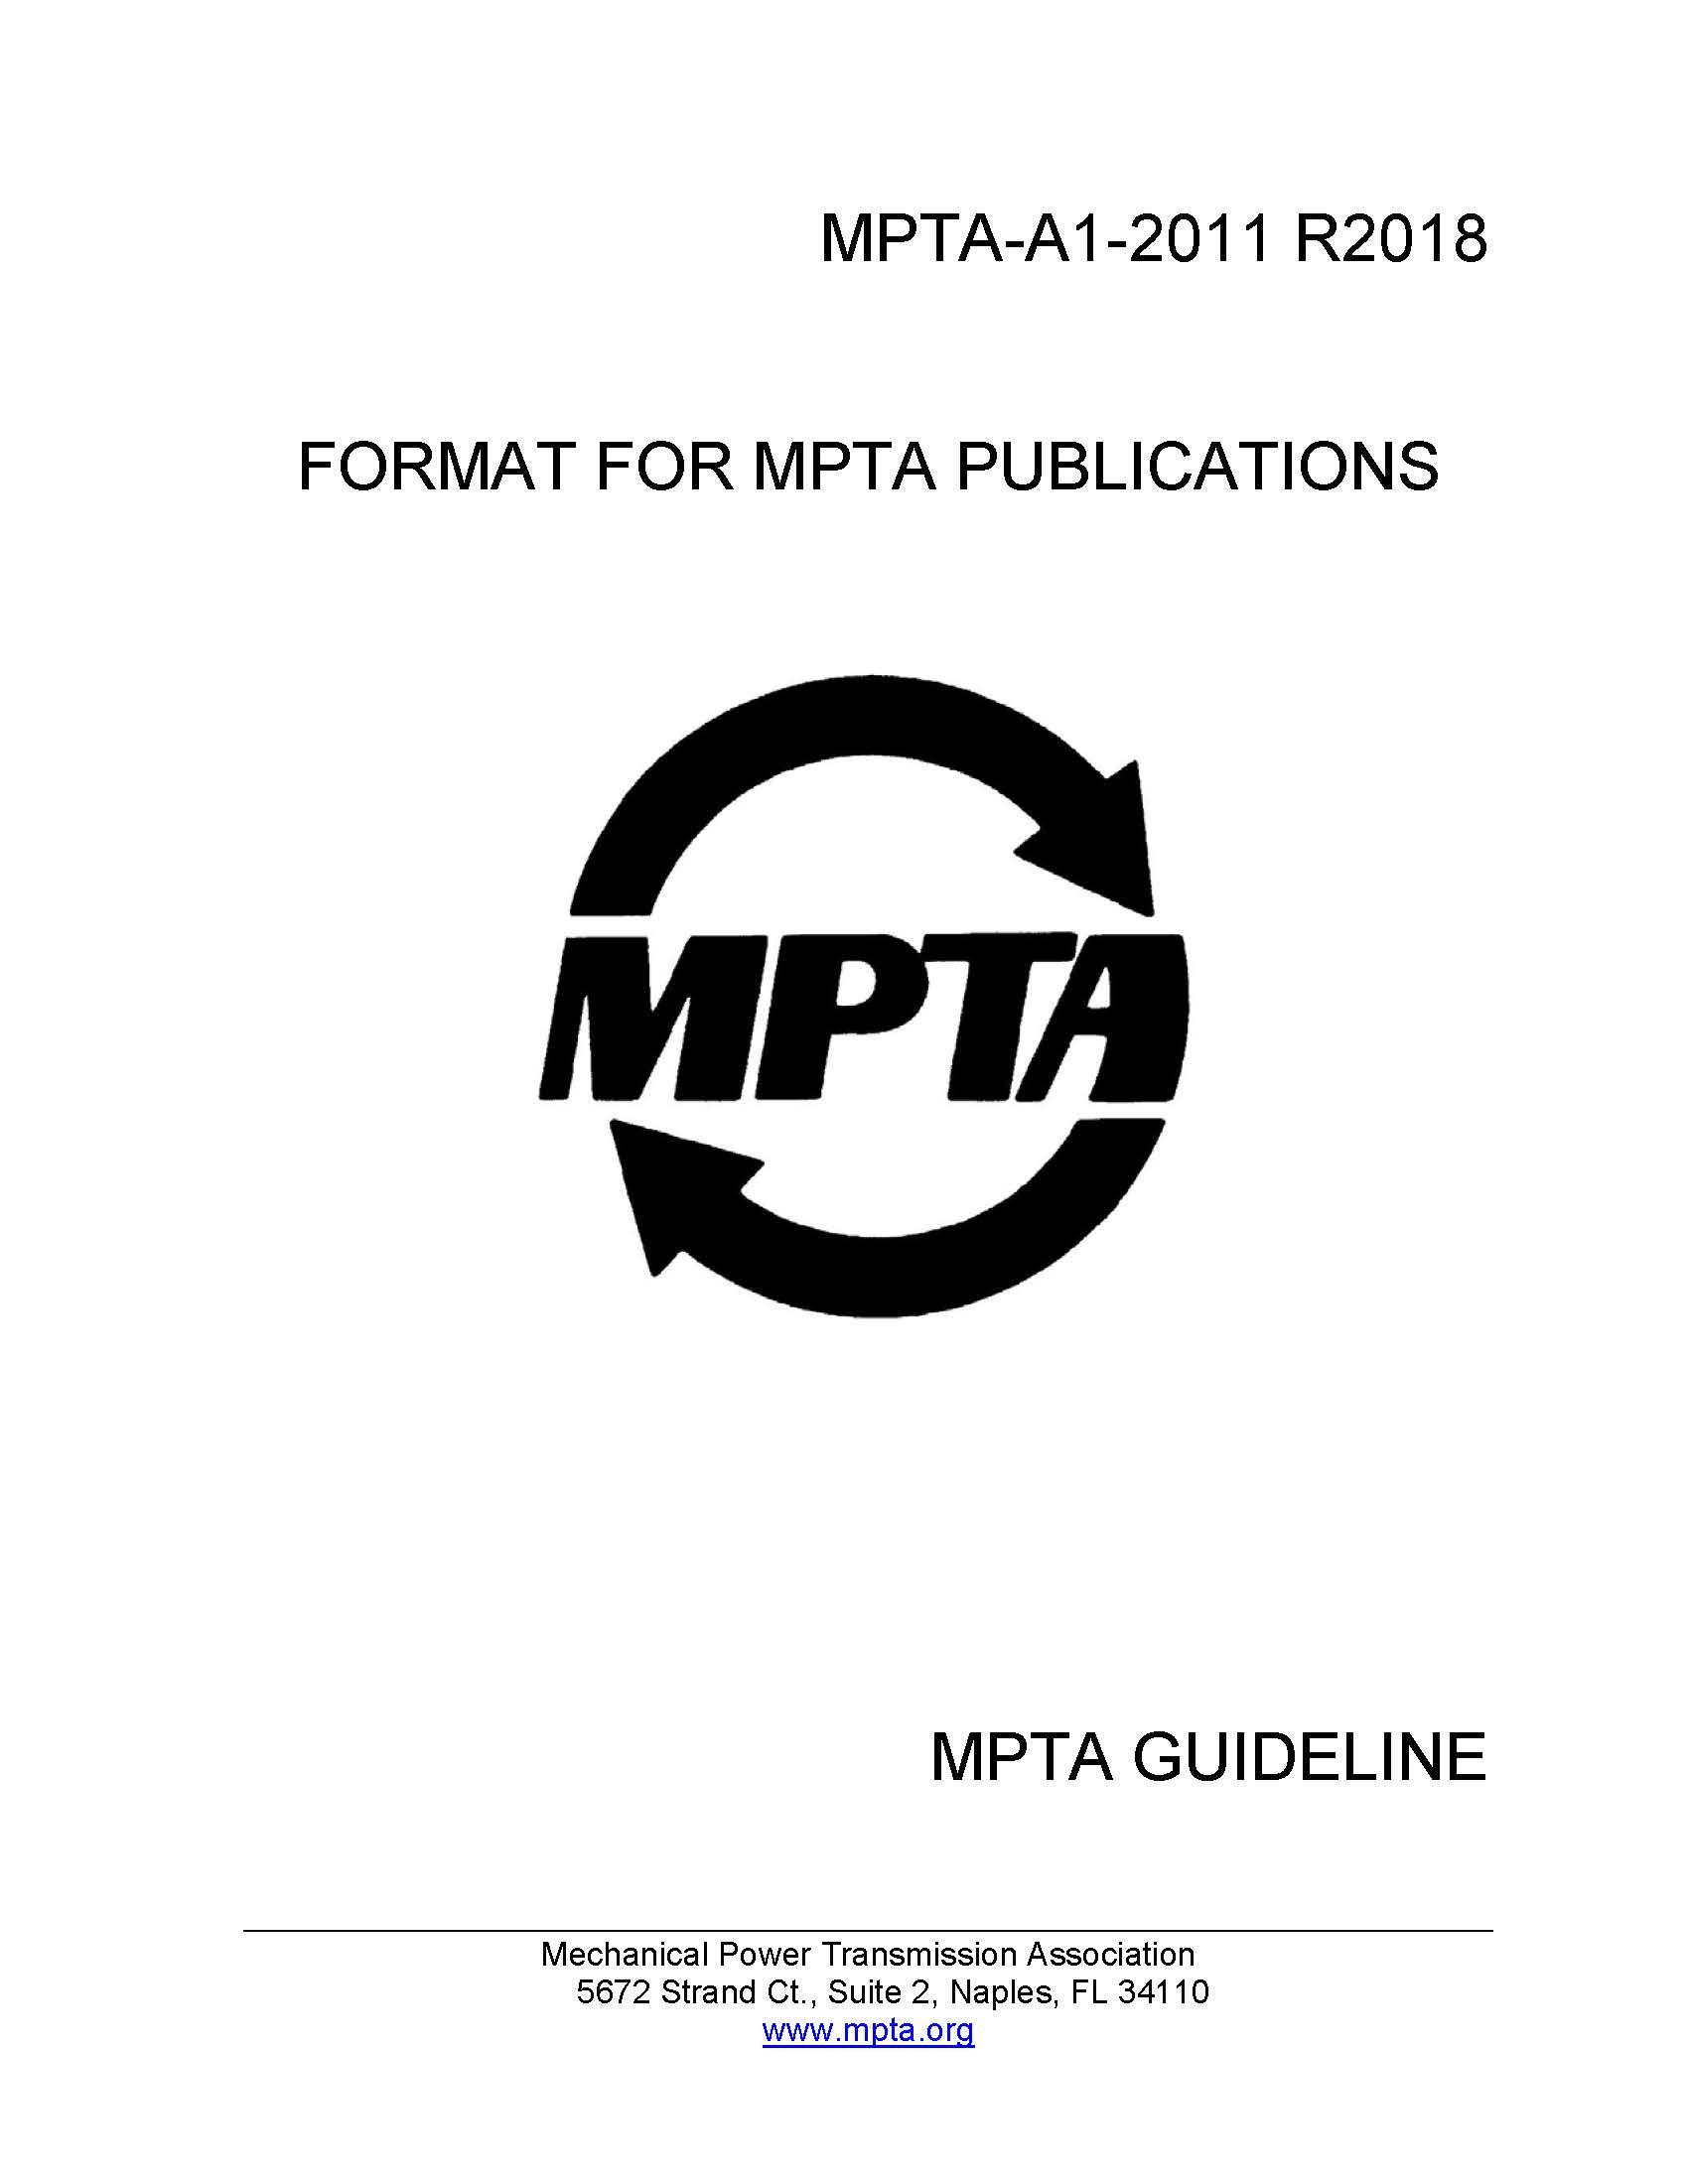 Standards | Mechanical Power Transmission Association